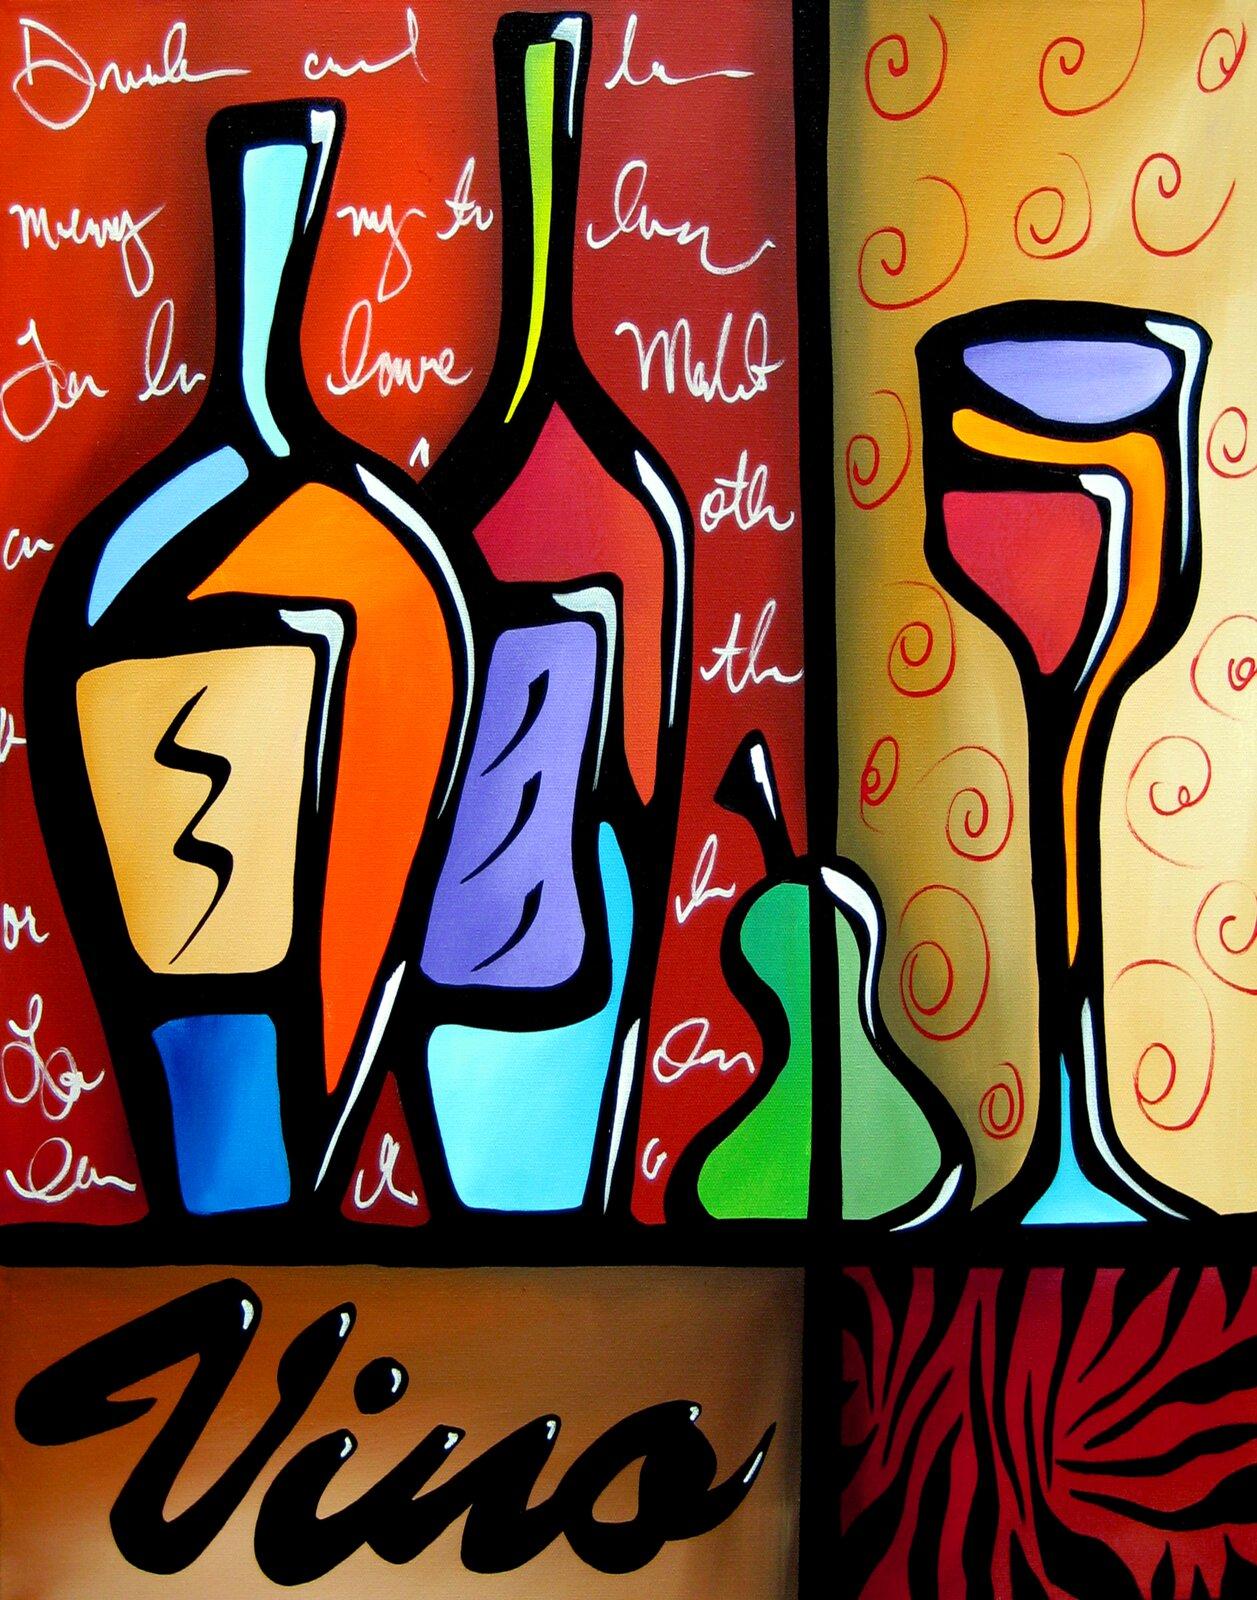 Wine Wall Decorations - 'Vino Wine' Acrylic Painting Print